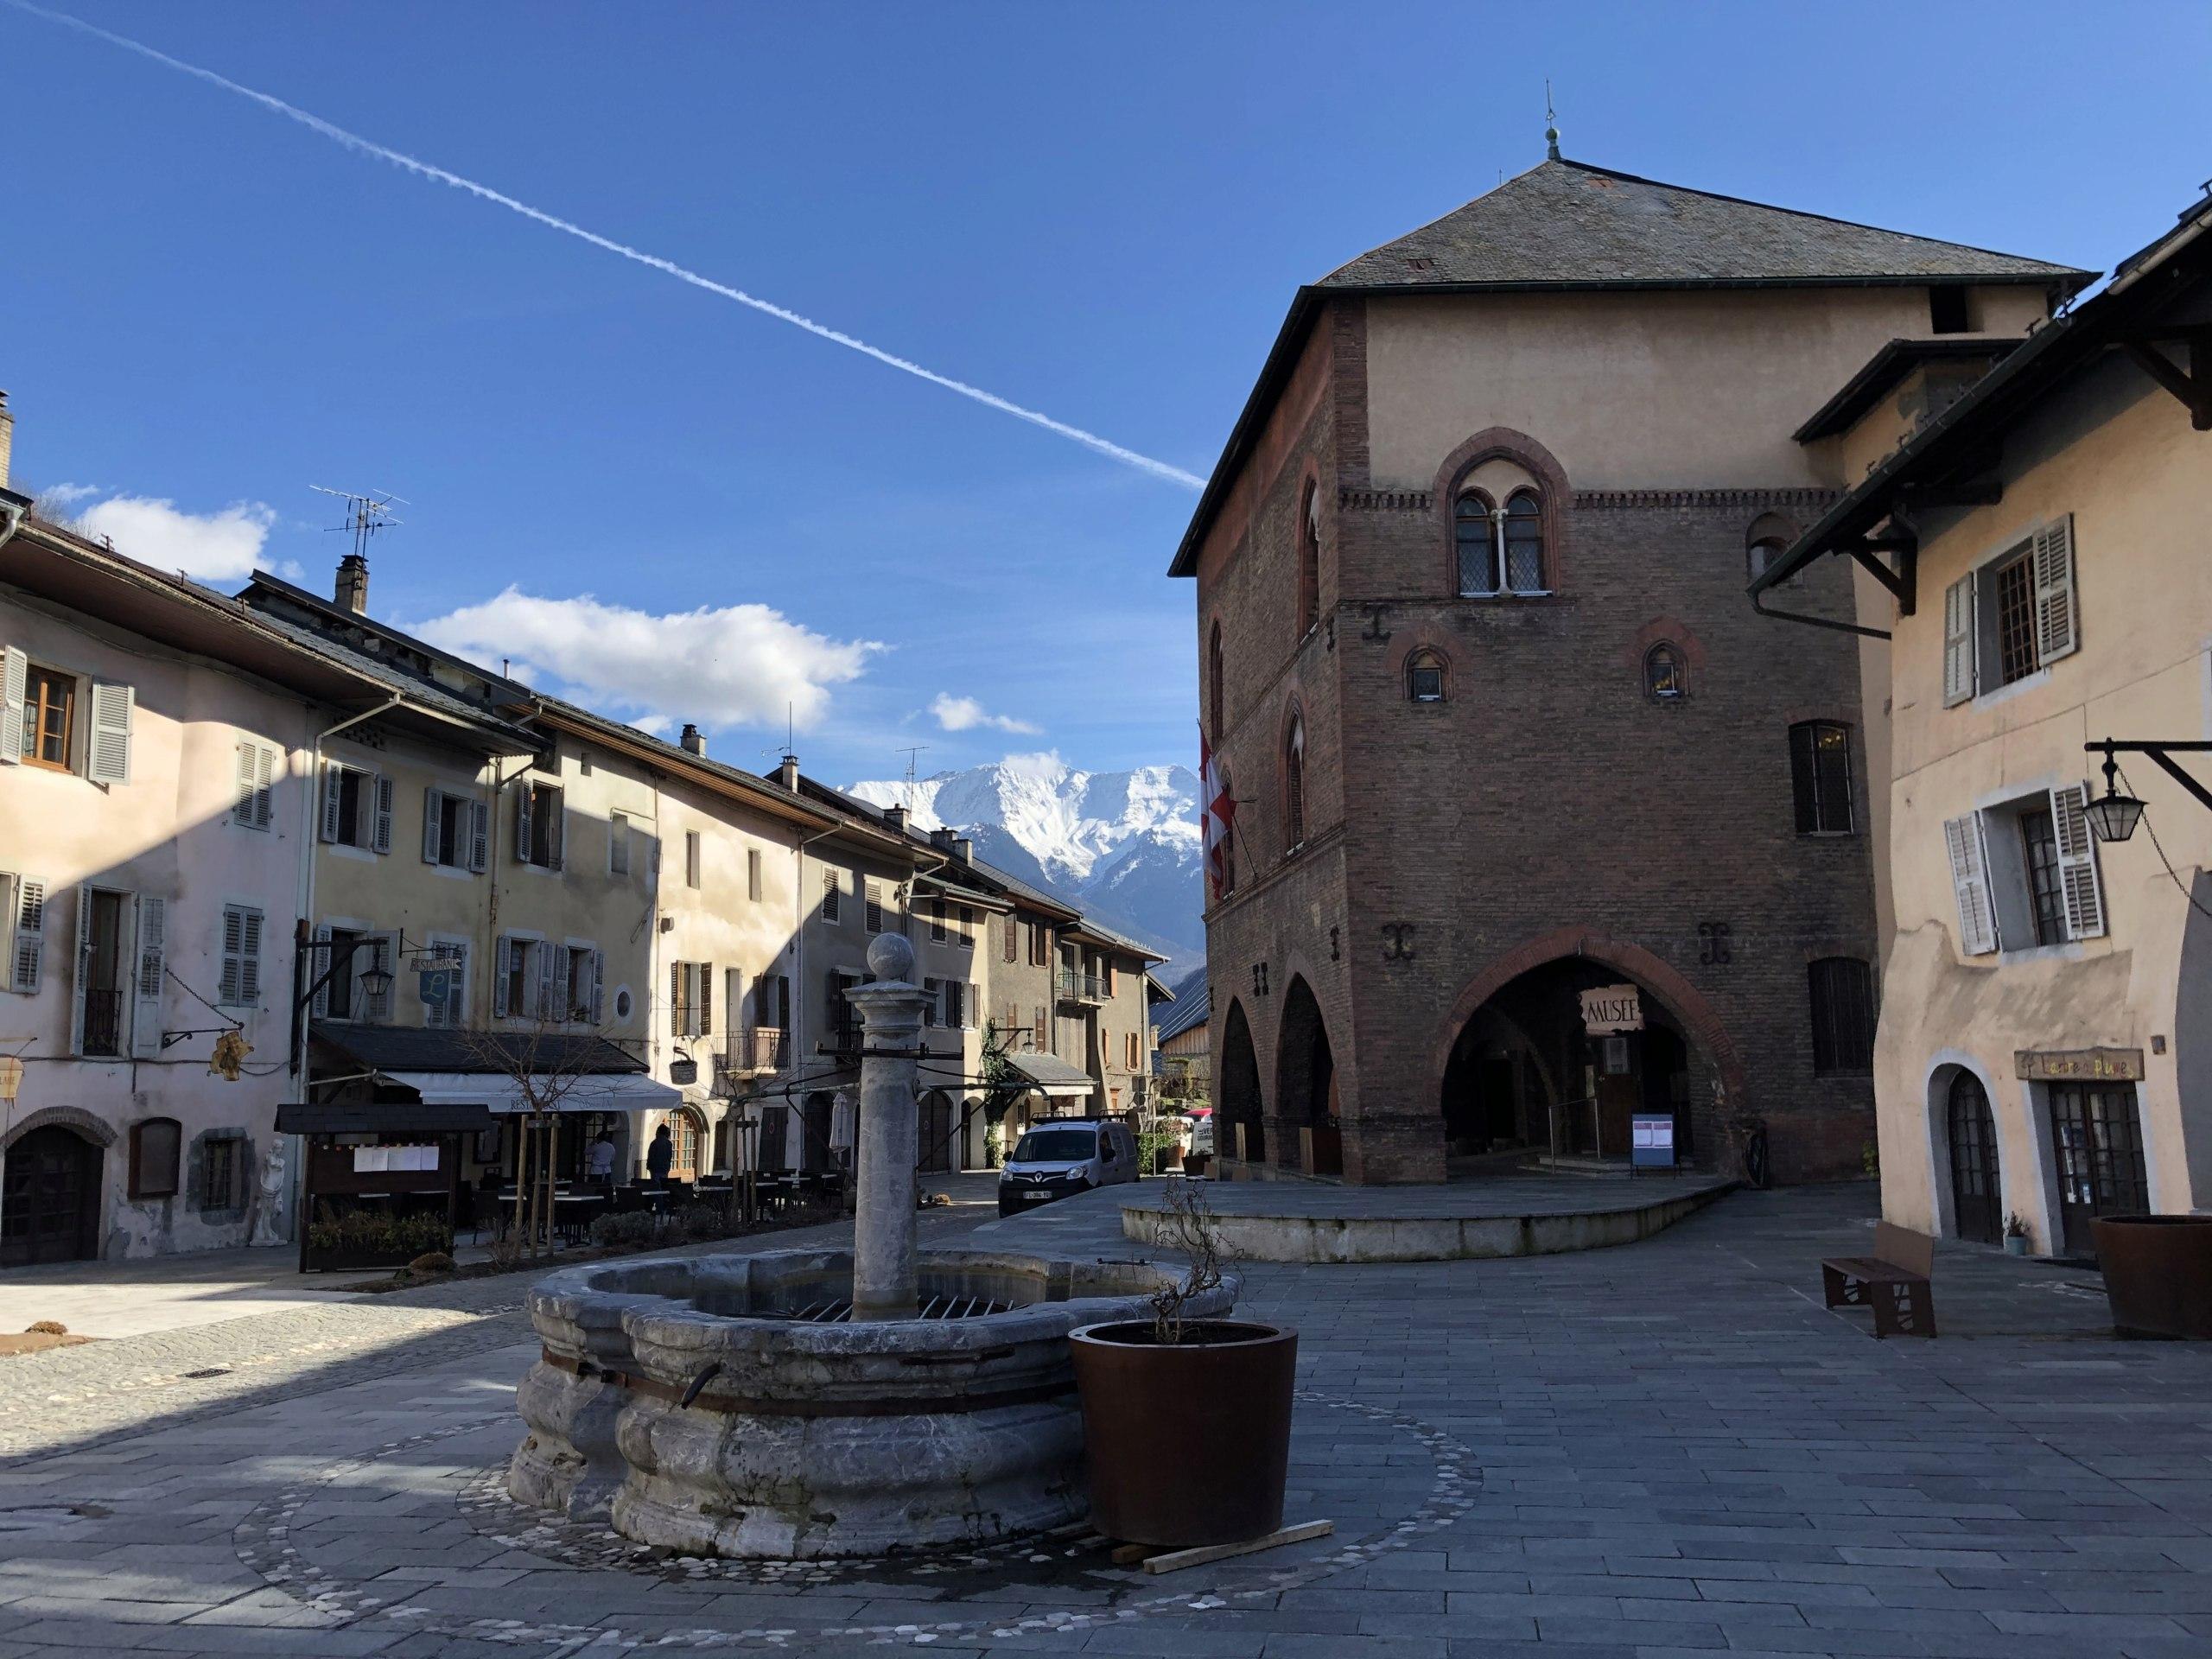 Petites balades en Rhône-Alpes - Page 2 Confla20